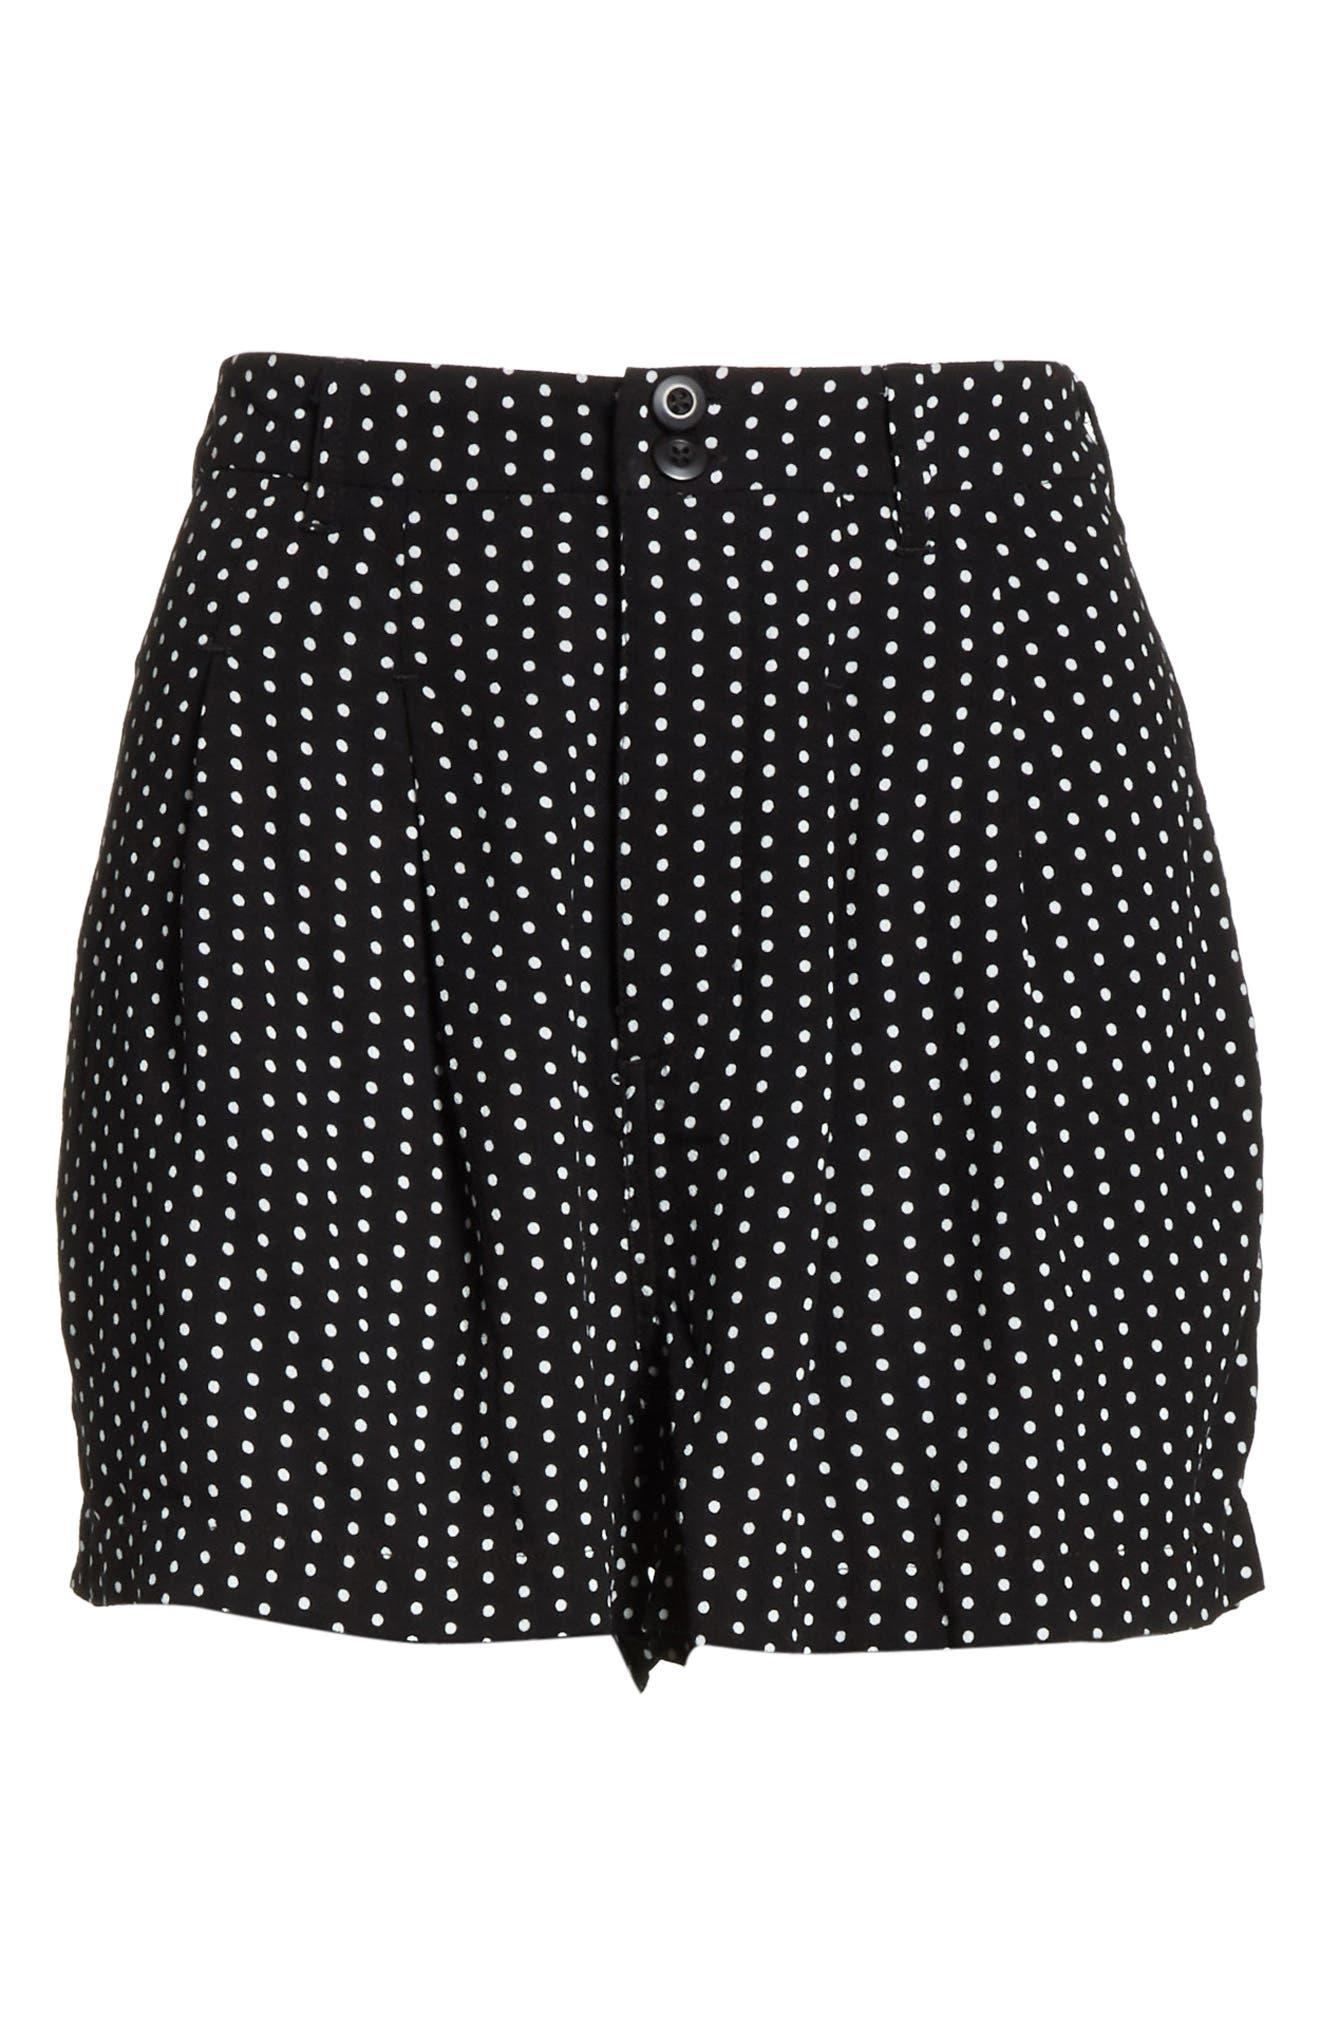 Magdalene Polka Dot Pleated Shorts,                             Alternate thumbnail 6, color,                             001